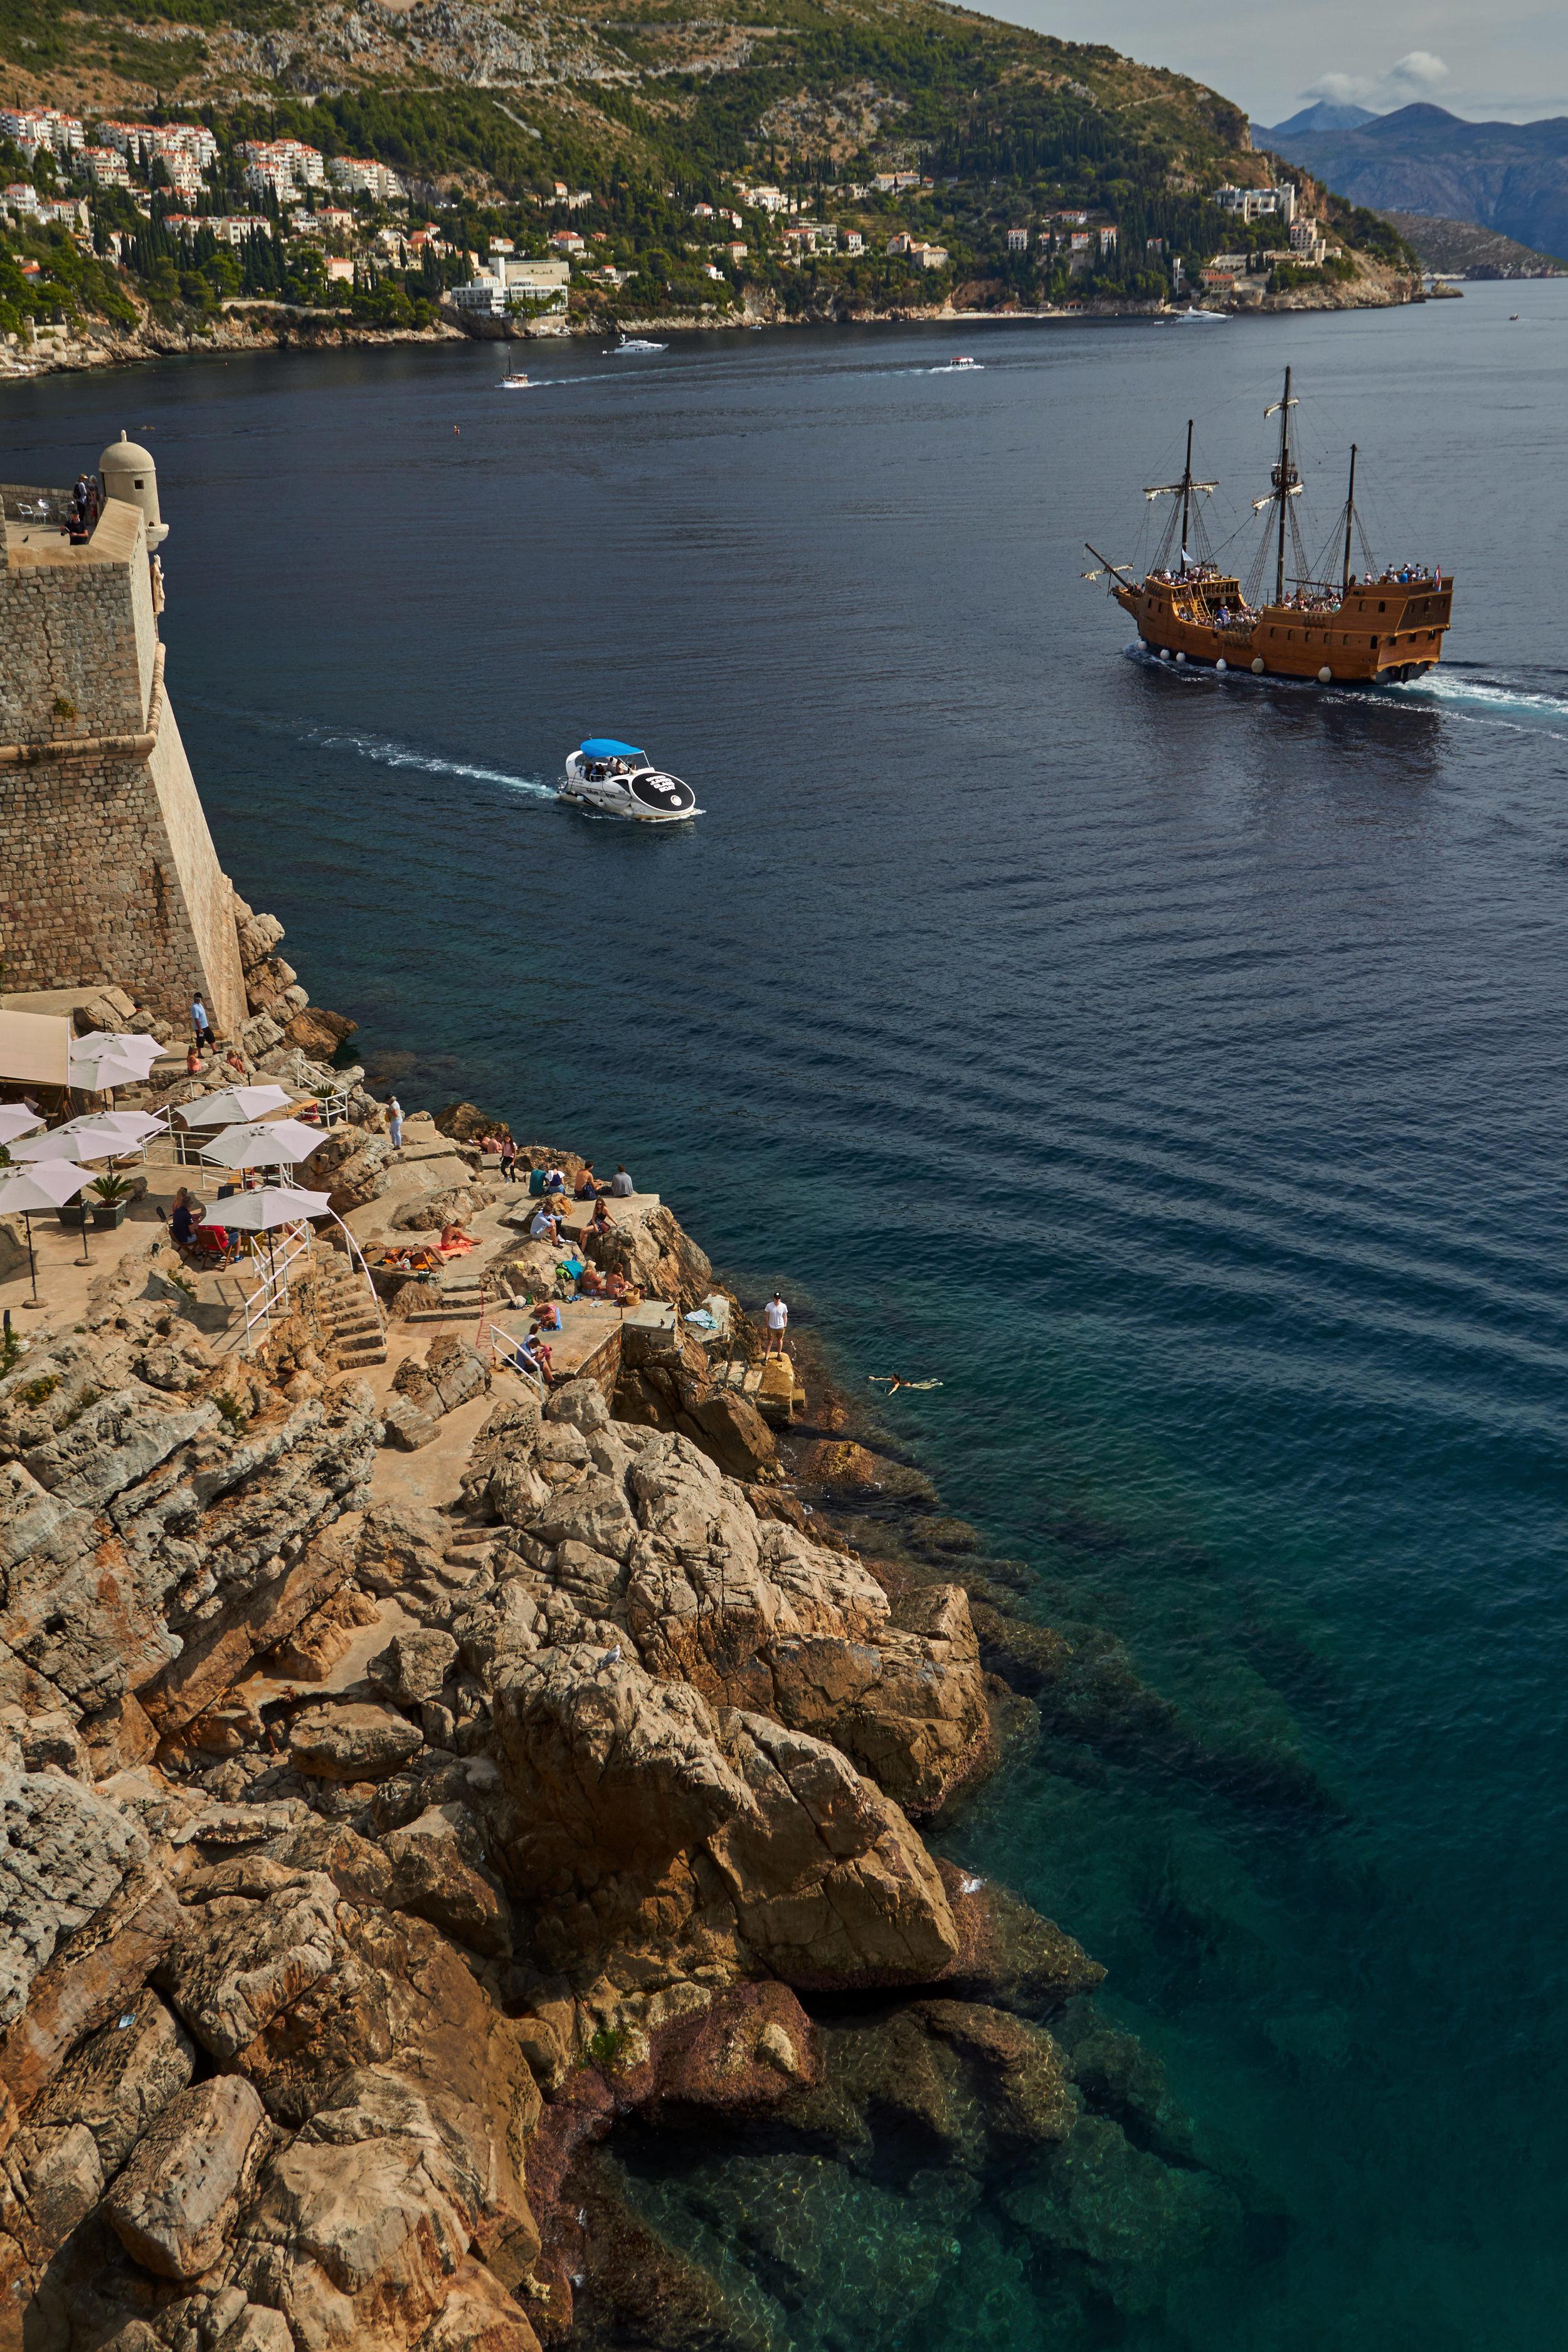 4_24-09-17_Dubrovnik.jpg